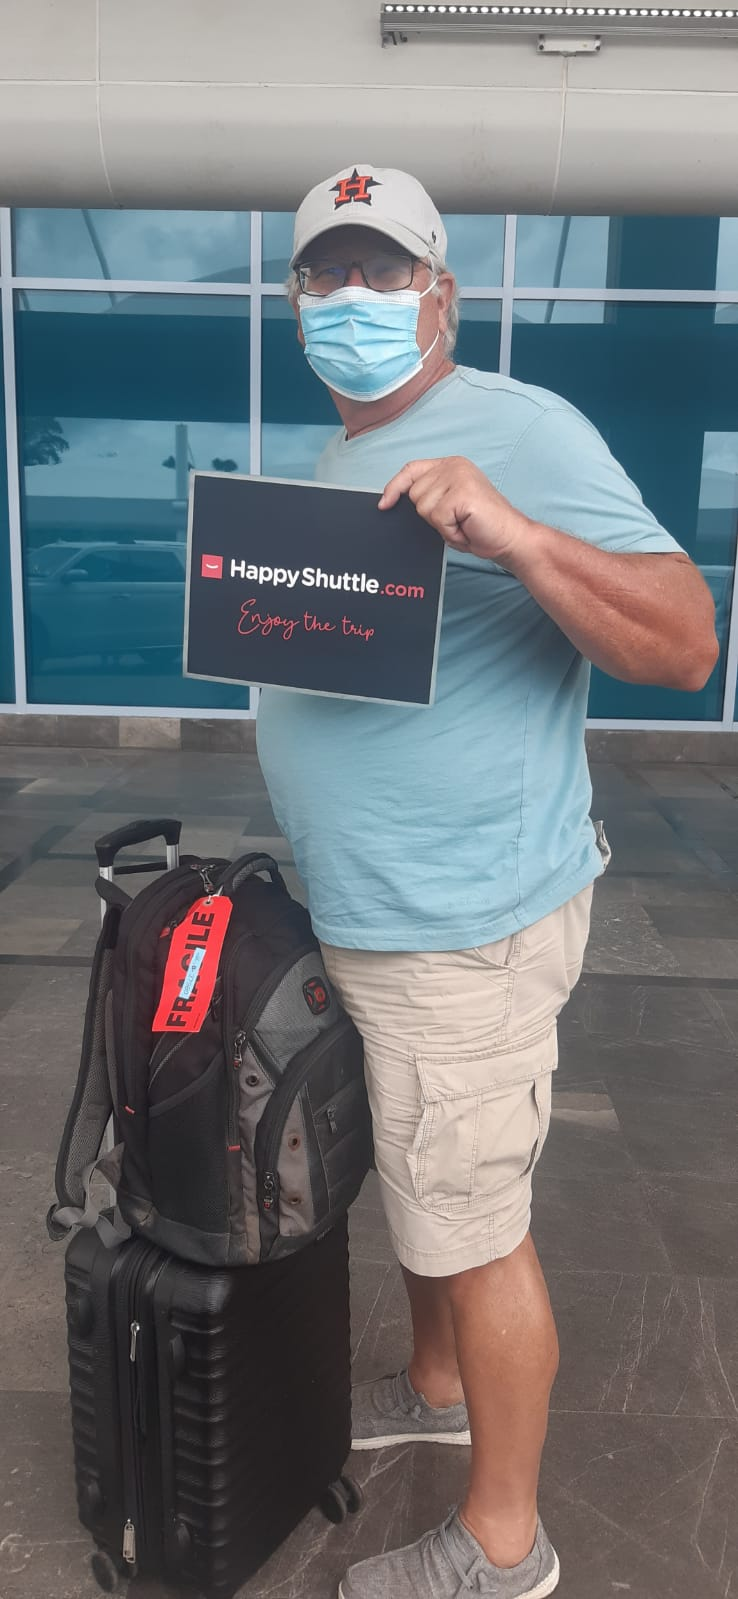 Happy shuttle Customer